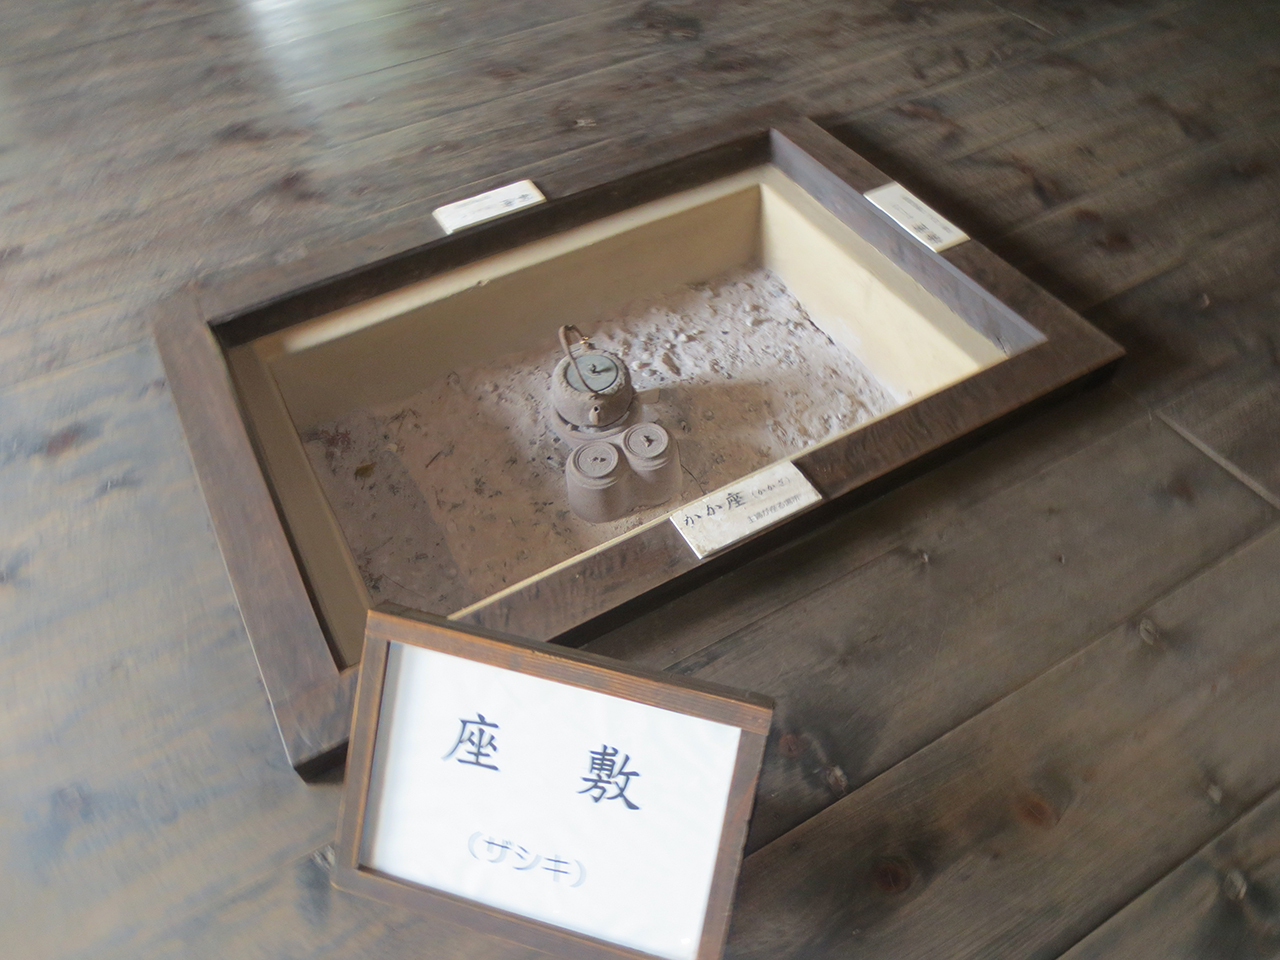 実籾本郷公園の投稿写真6